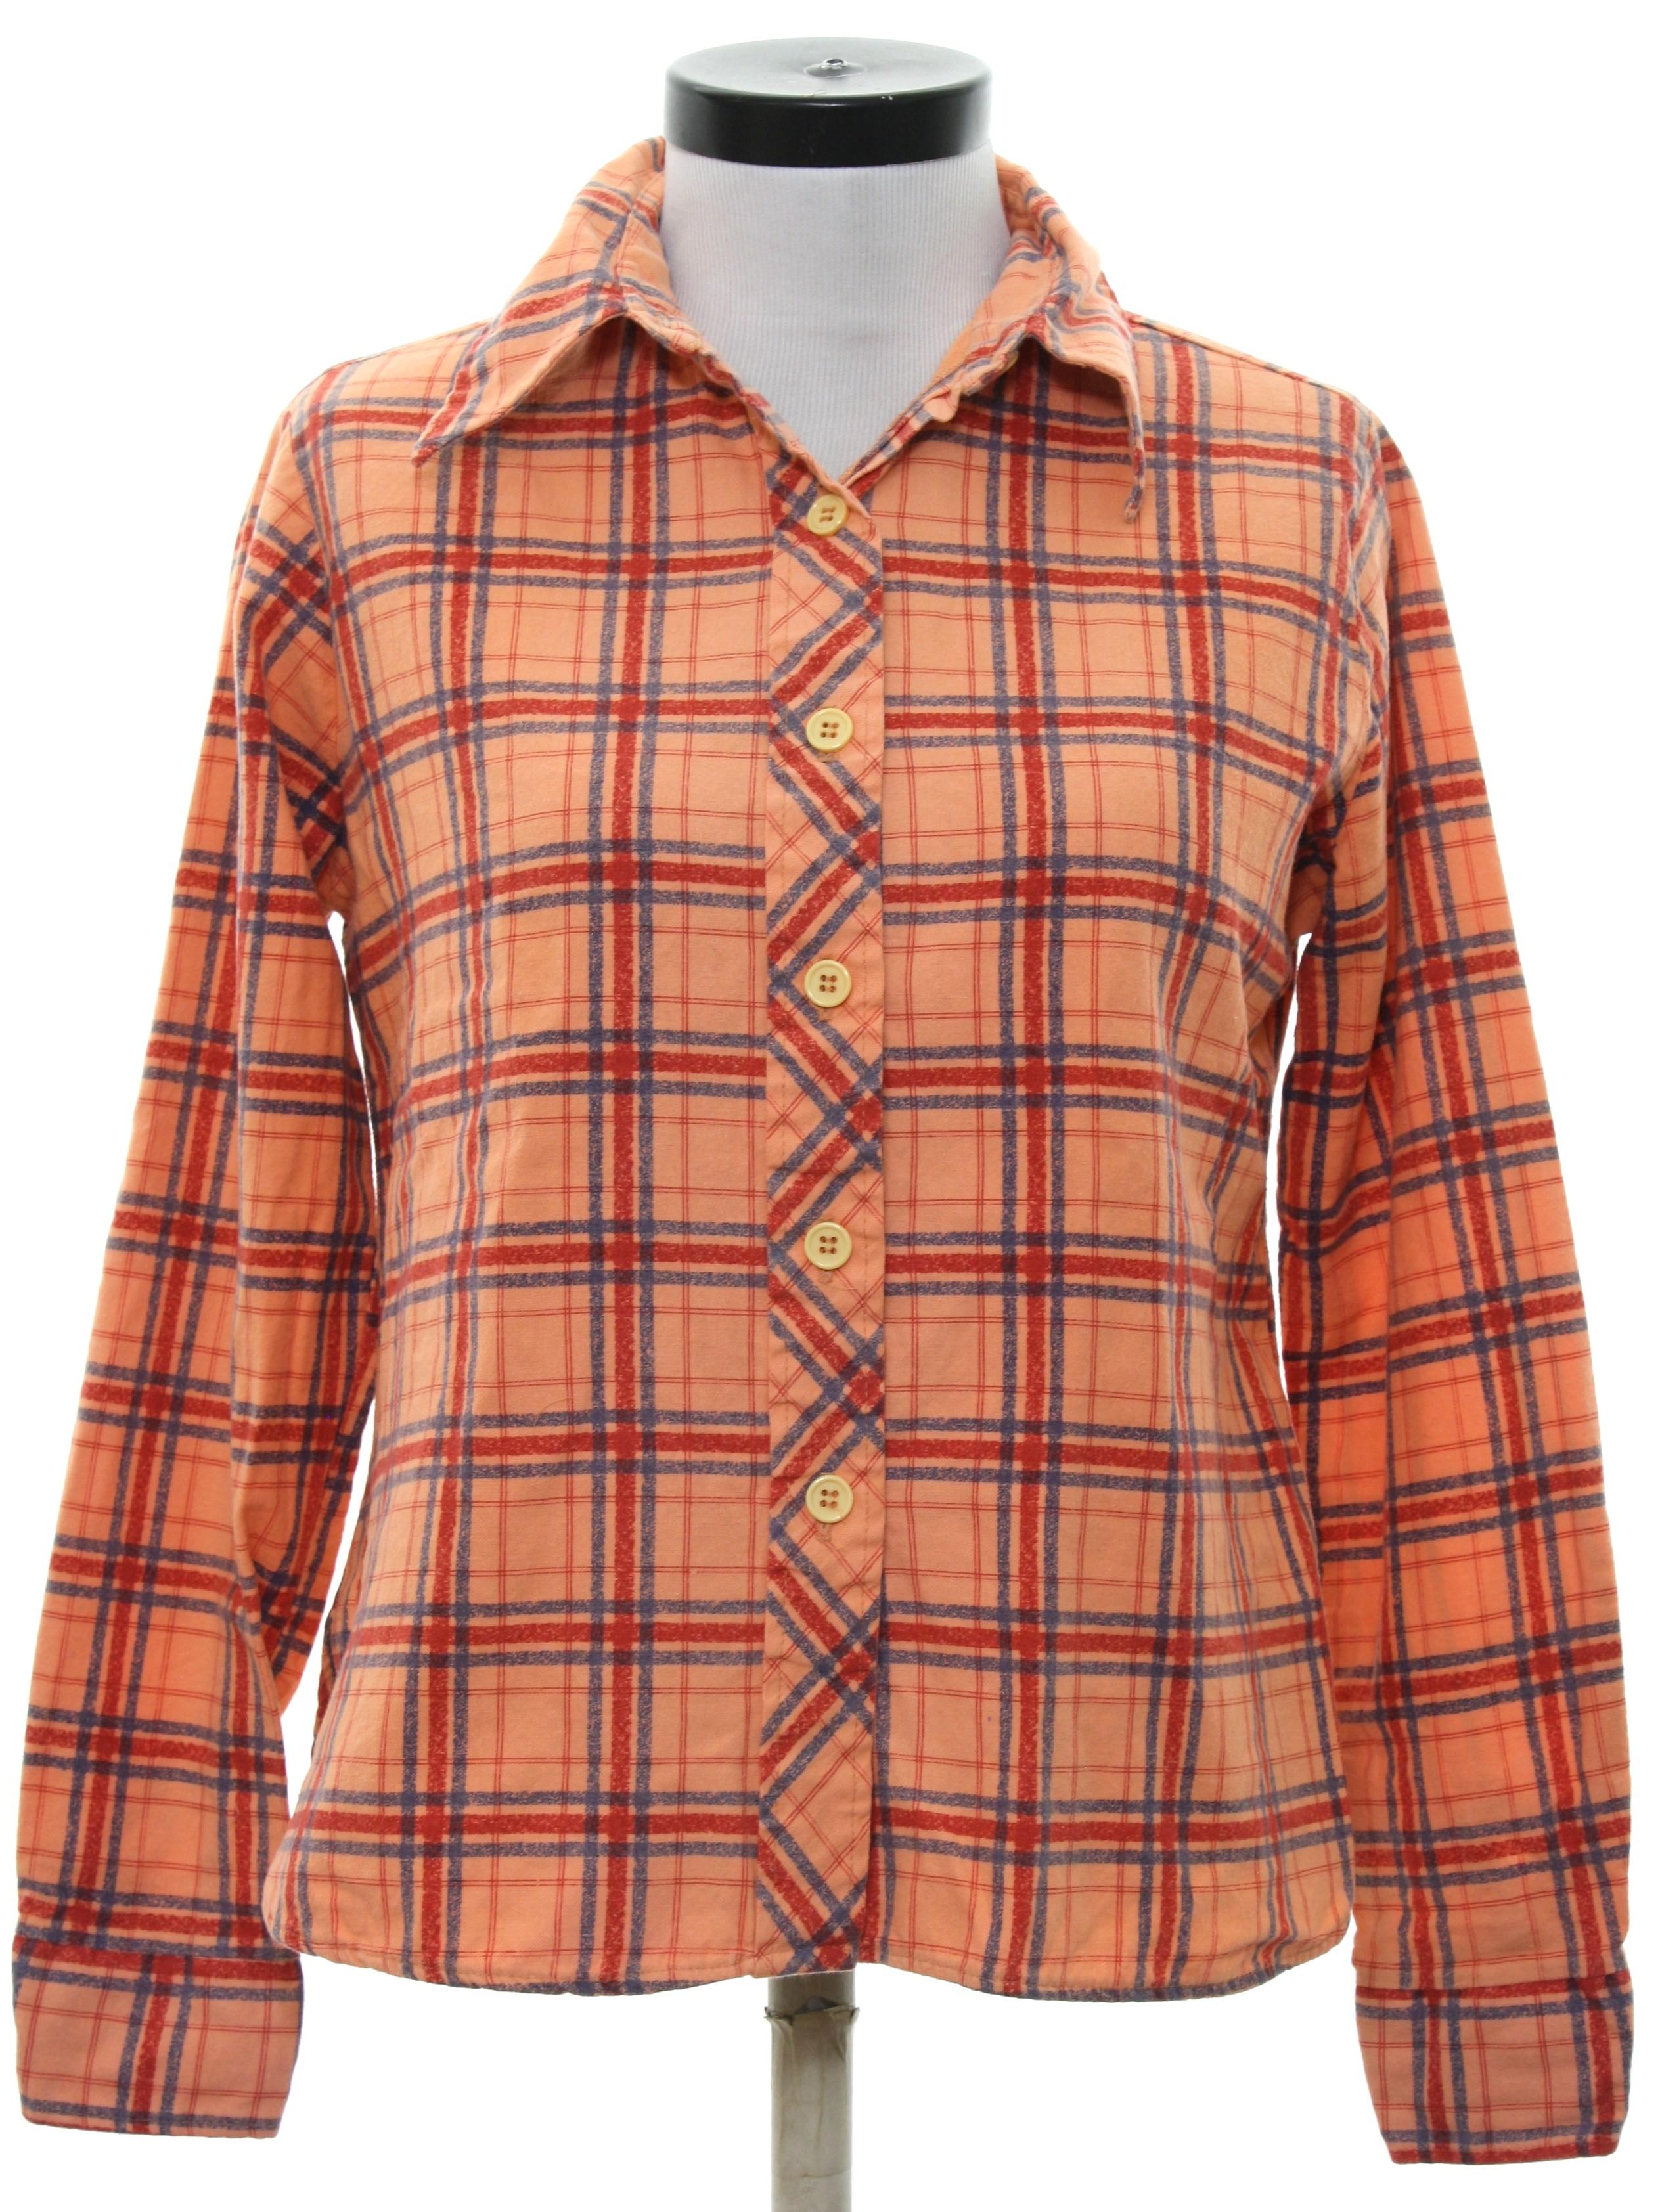 Retro 1970 39 S Shirt Sears Jr Bazaar 70s Sears Jr